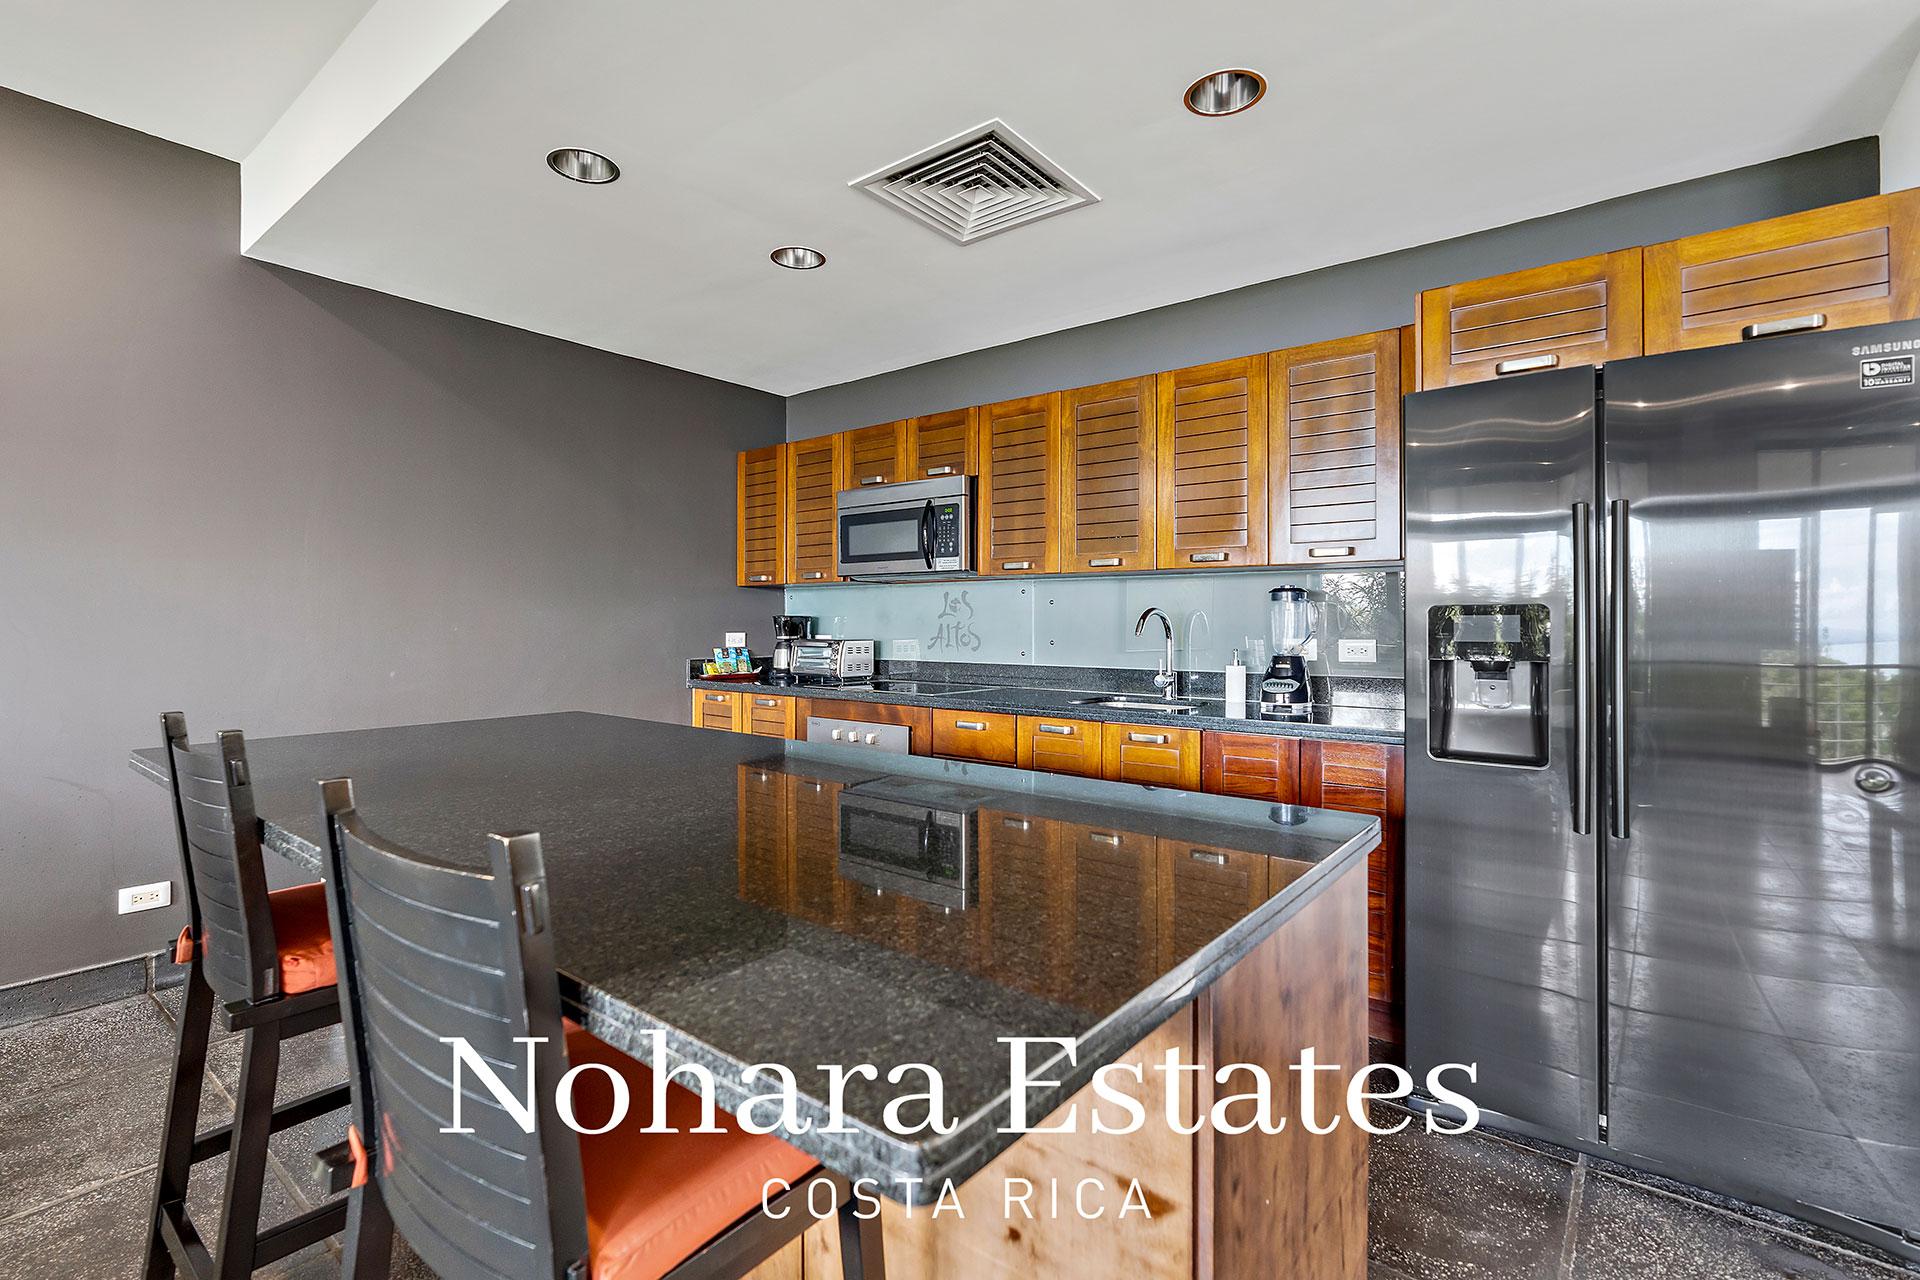 Nohara Estates Costa Rica 122 Apartment Quepos Los Altos 3